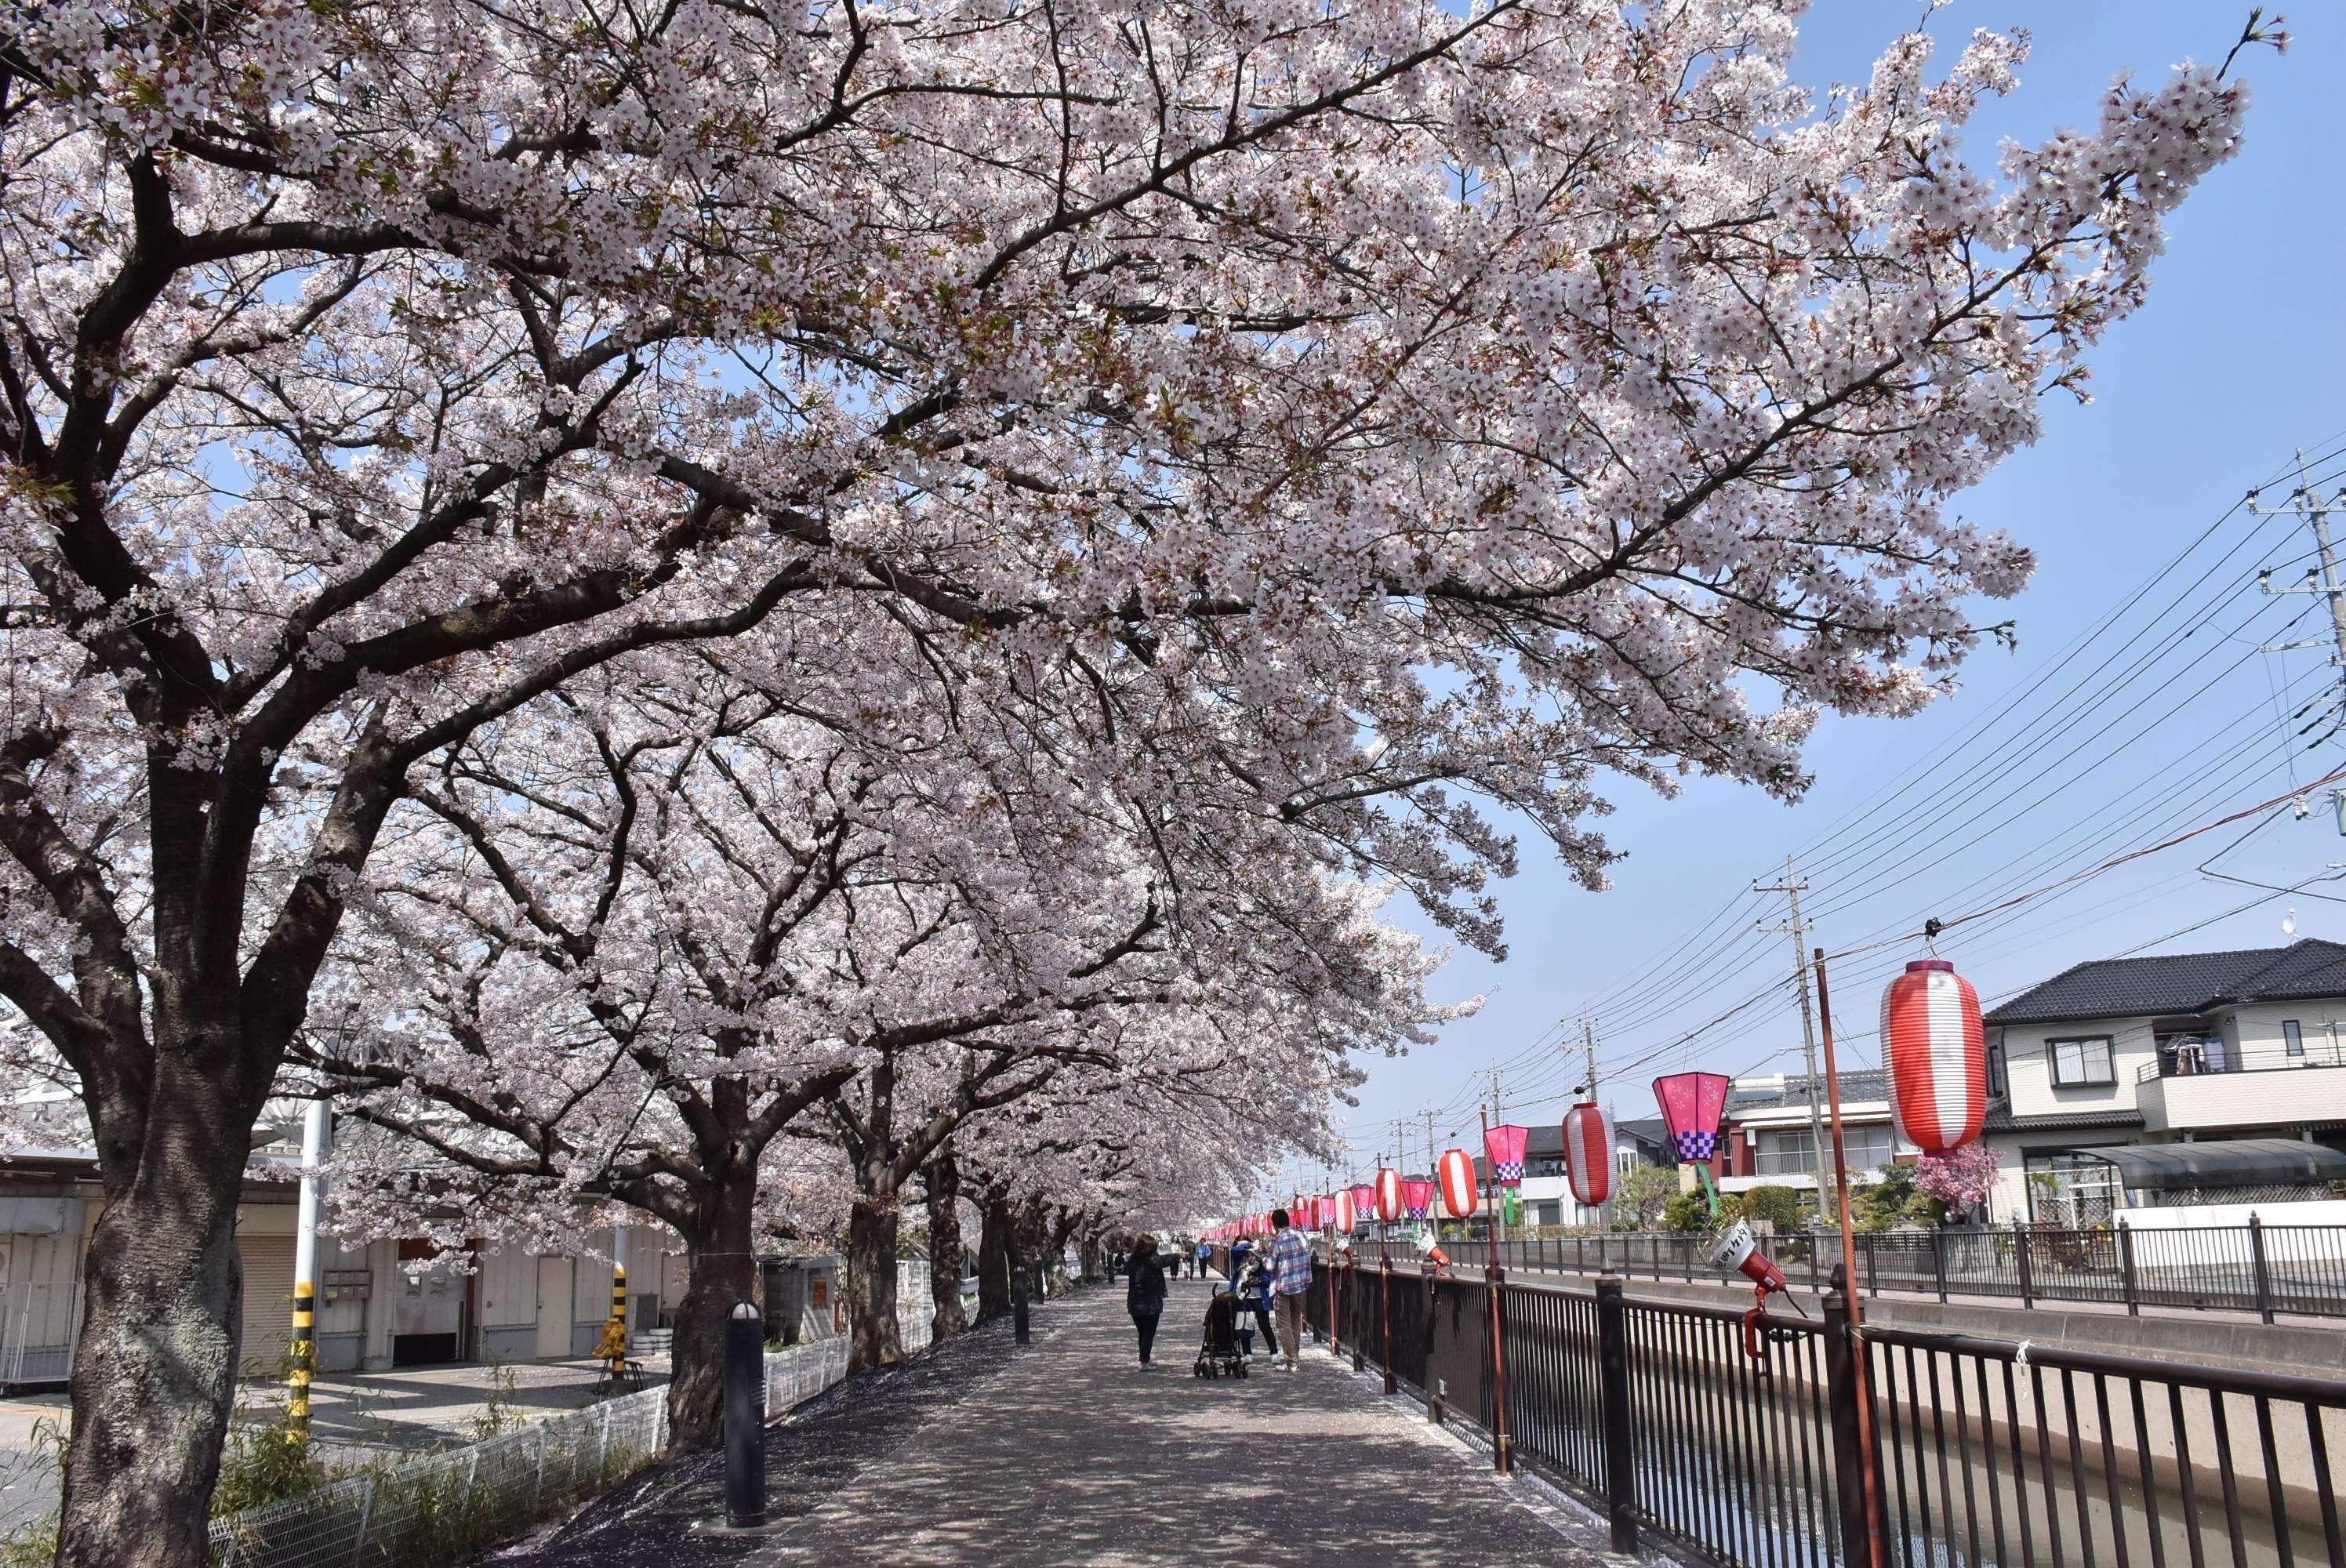 Hanyu Cherry blossom festival kasai irrigation canal